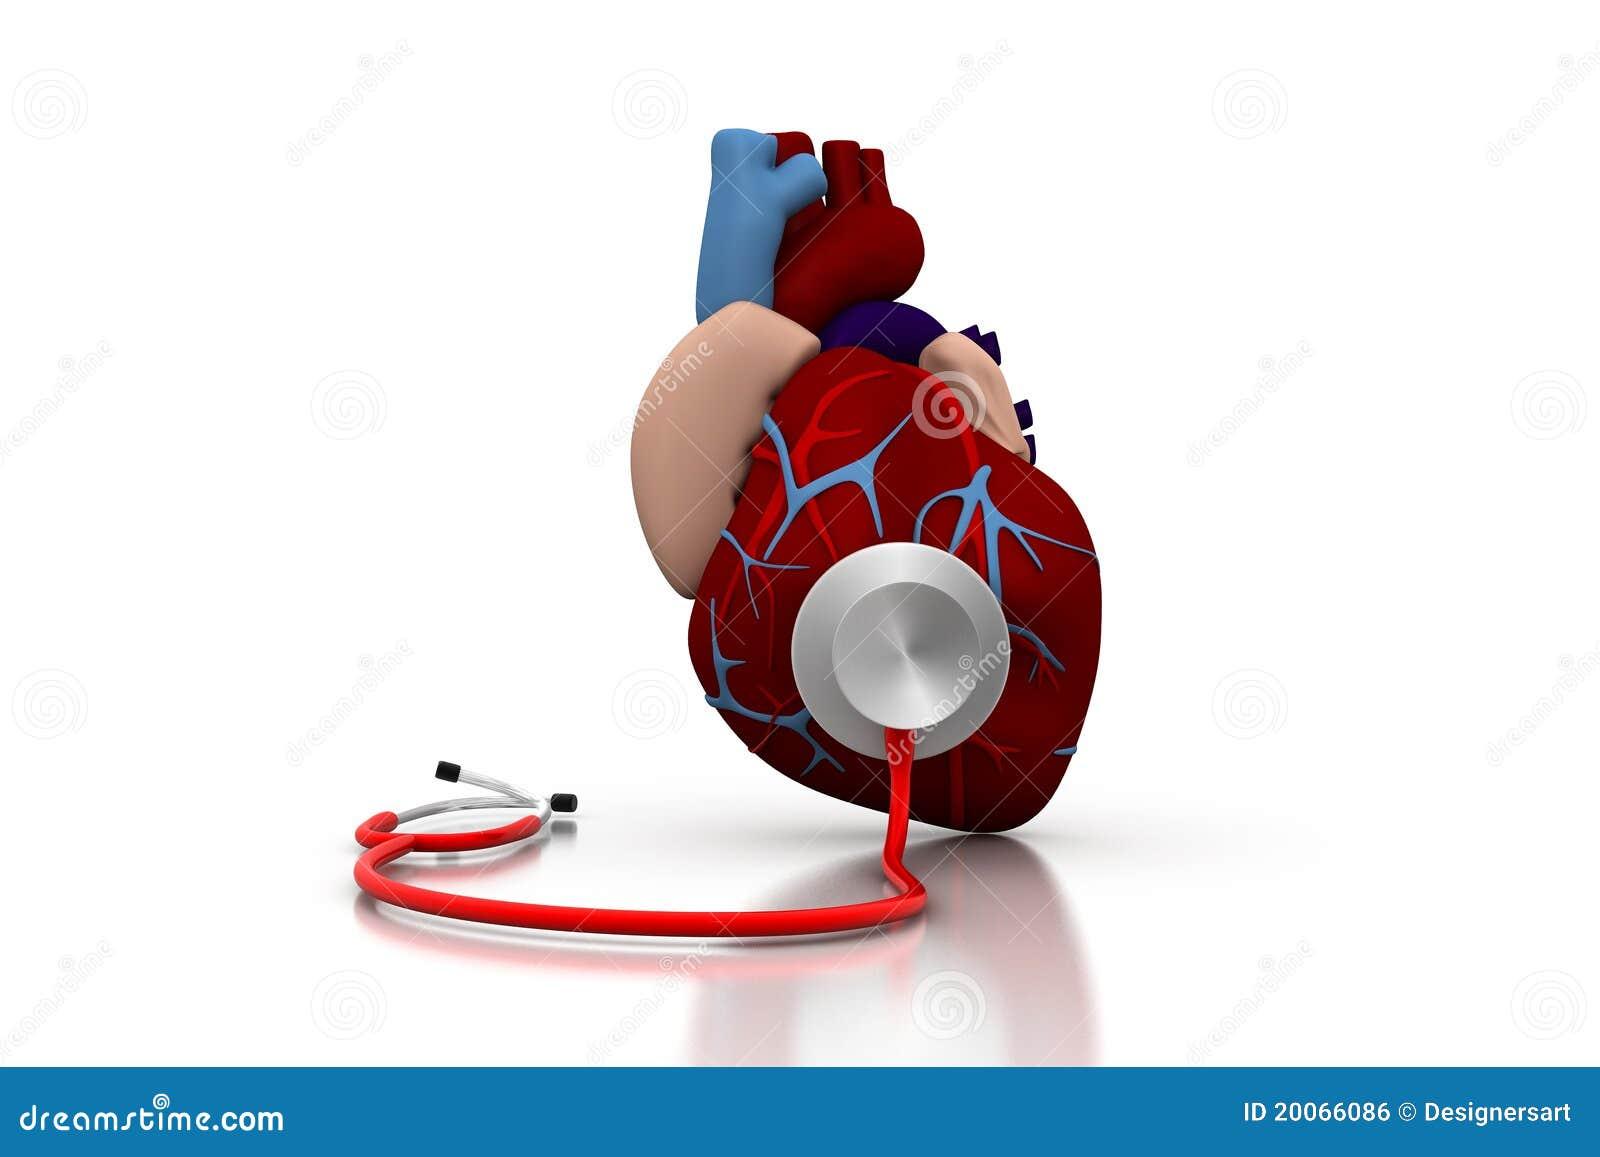 Stethoscope On A Heart Stock Illustration Image Of Exercise 20066086